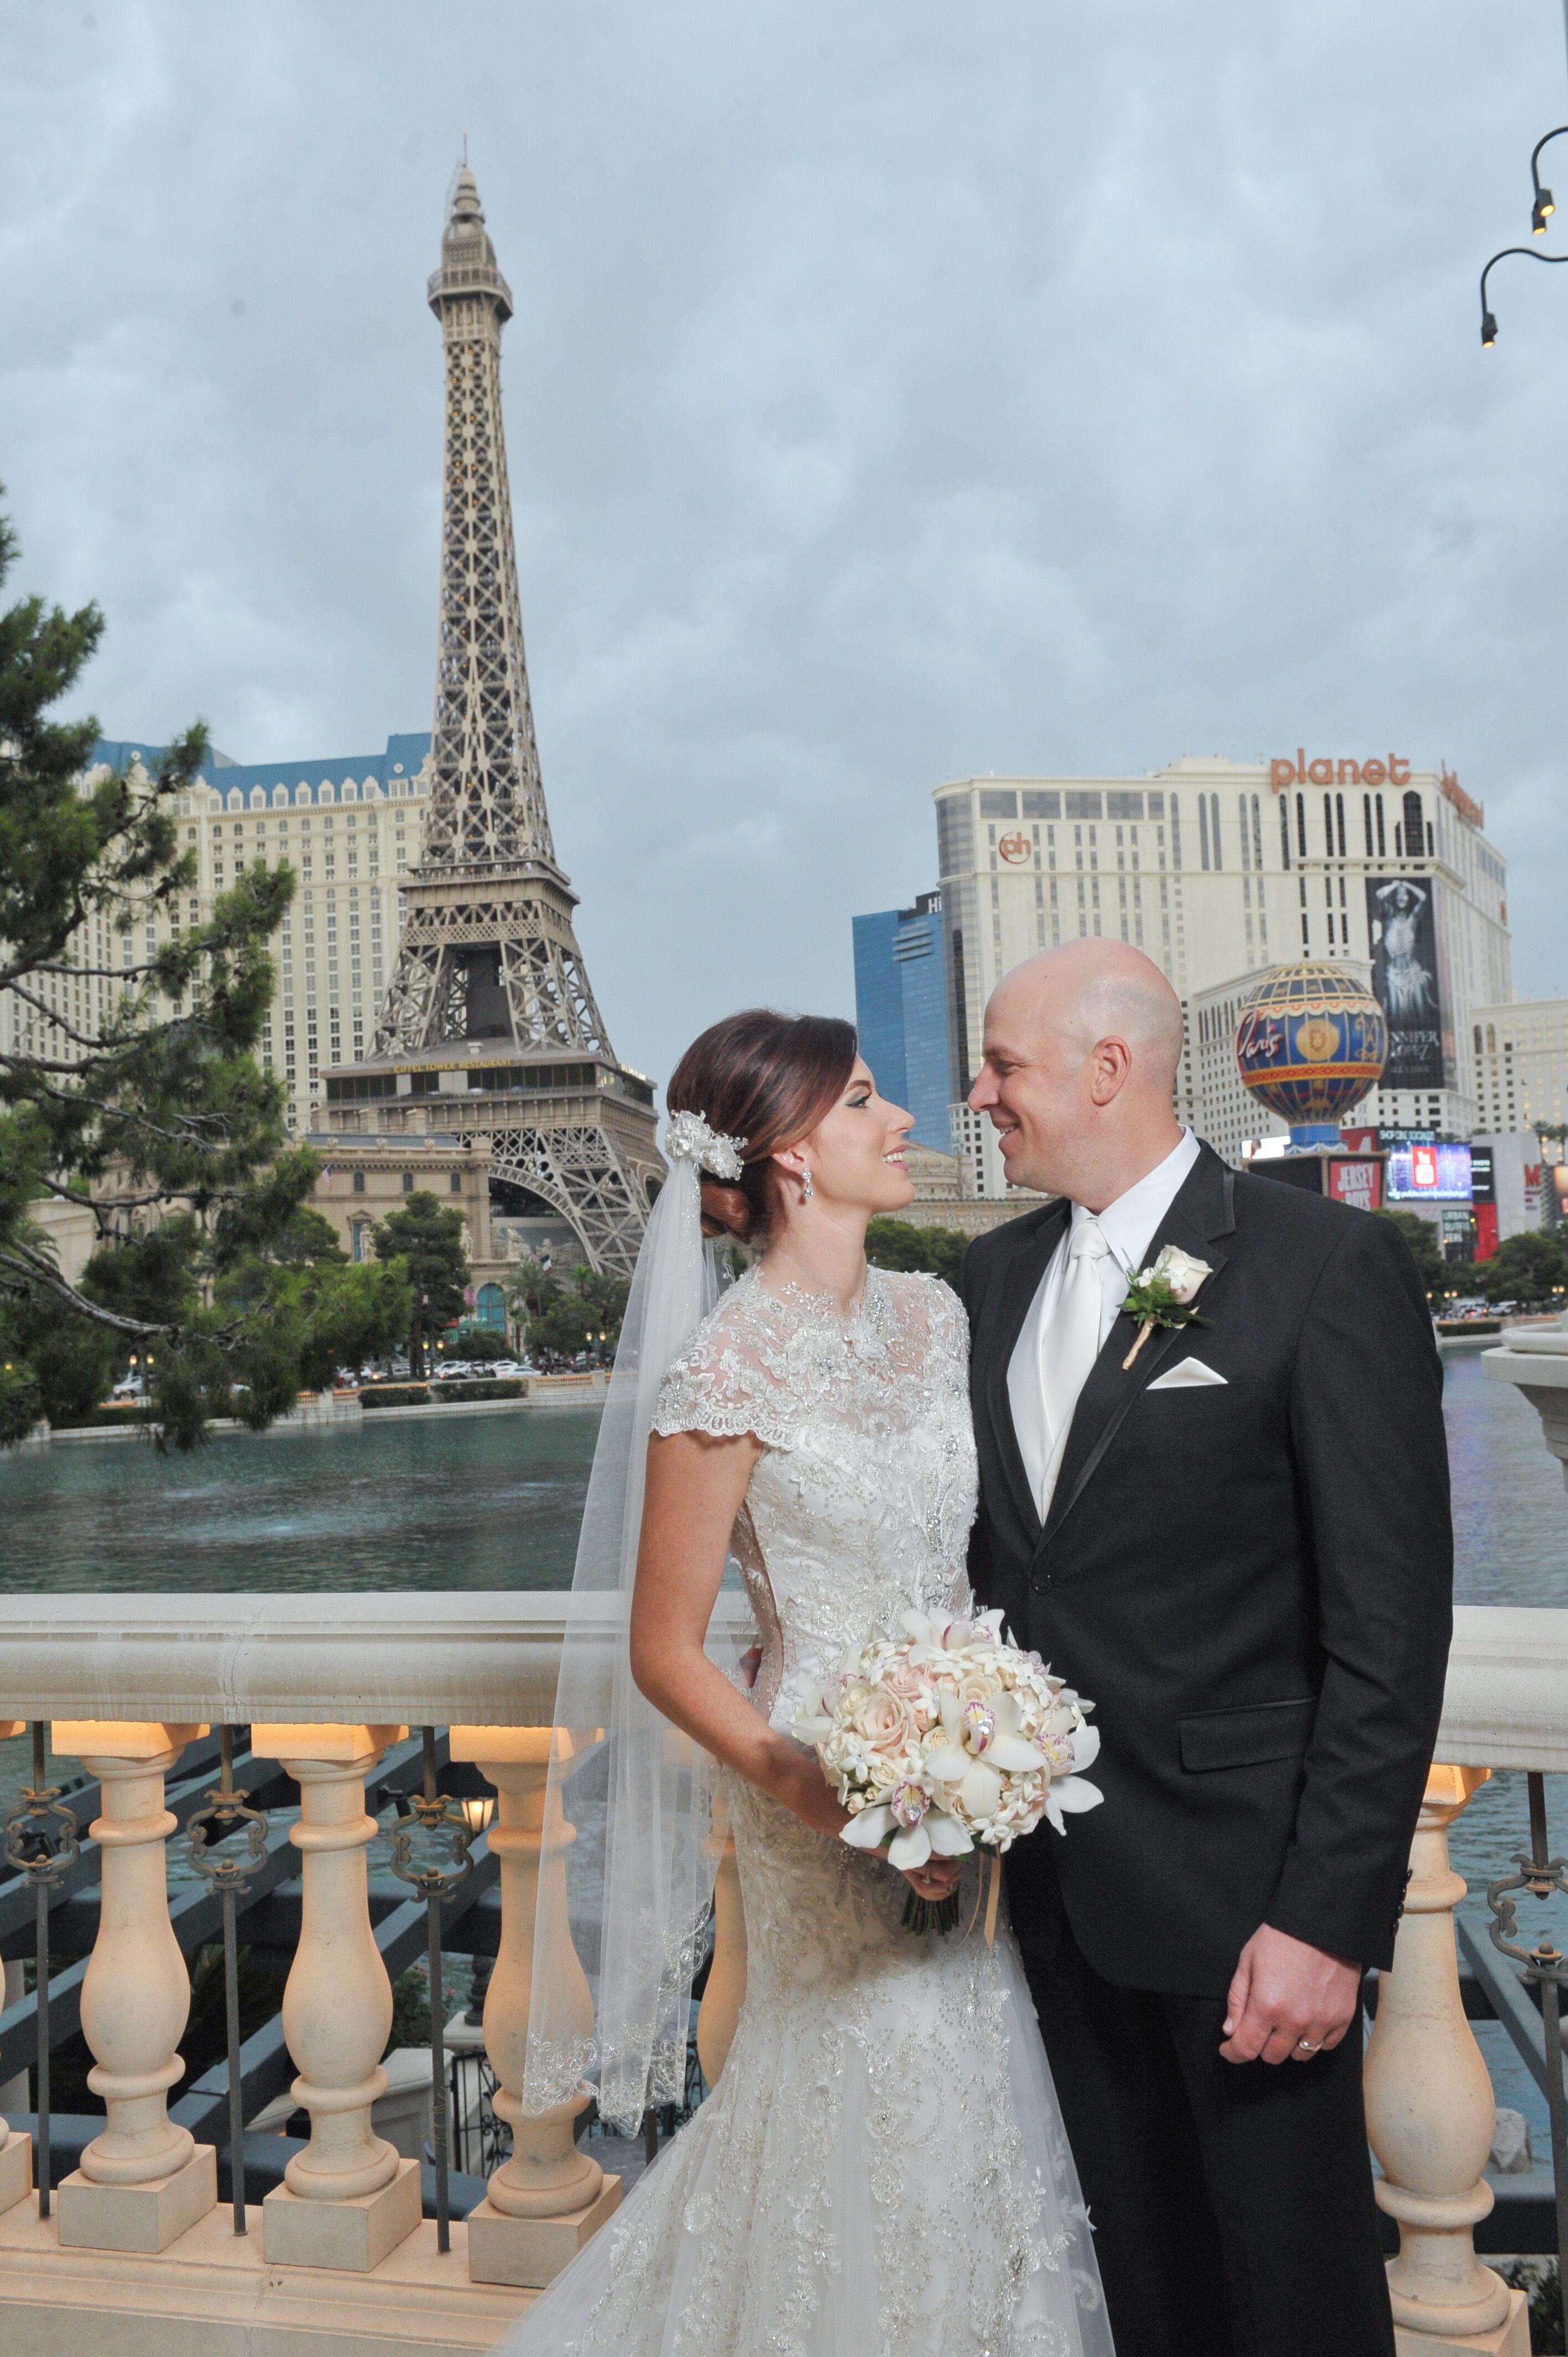 Weddings At Bellagio Las Vegas Nv